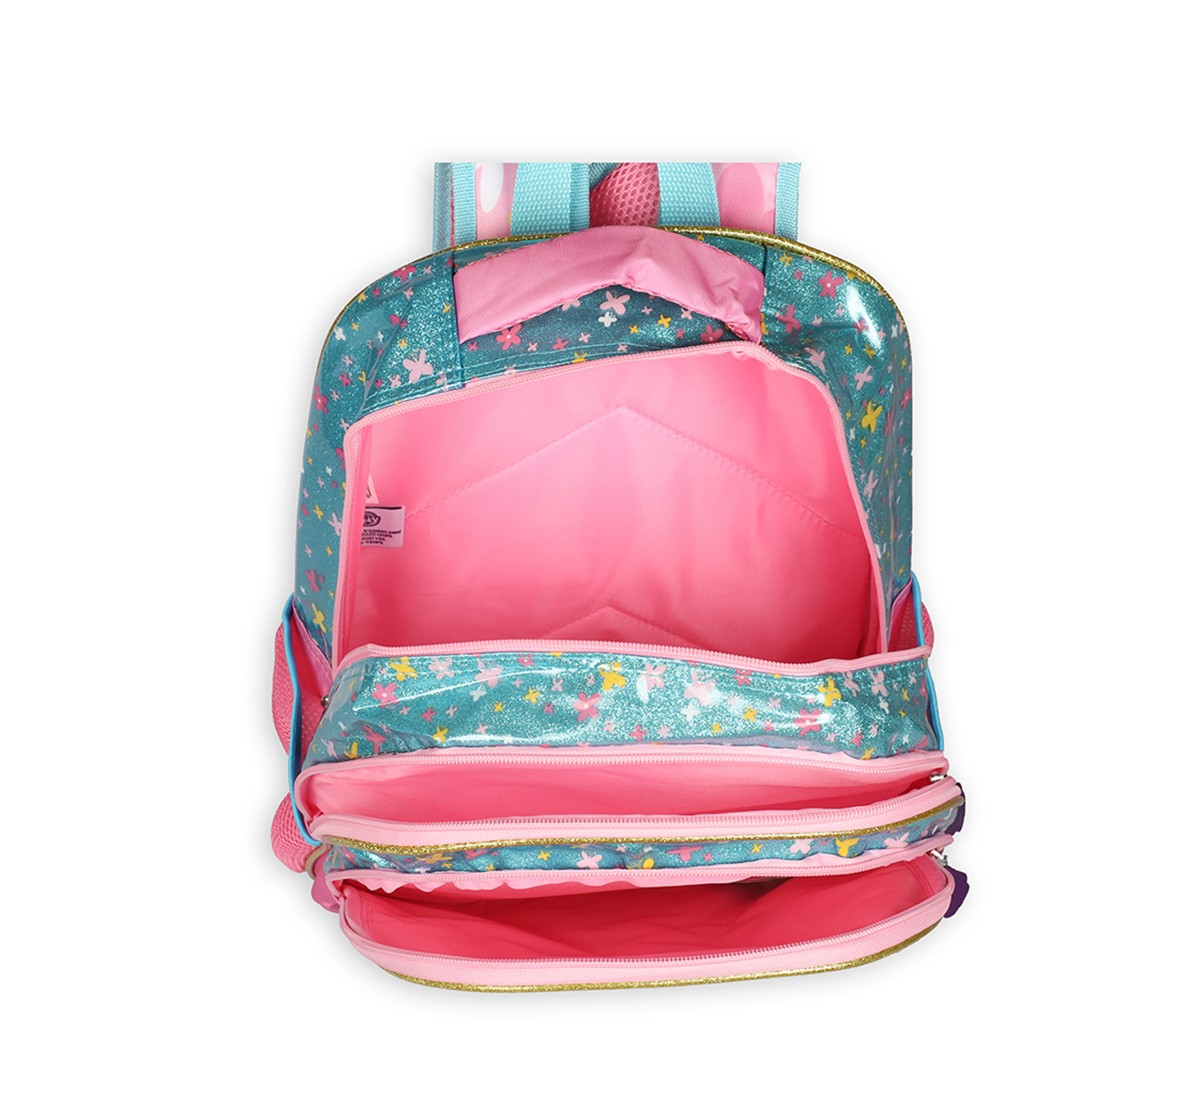 My Little Pony My Little Pony Glitter School Bag 41 Cm Bags for Girls age 7Y+